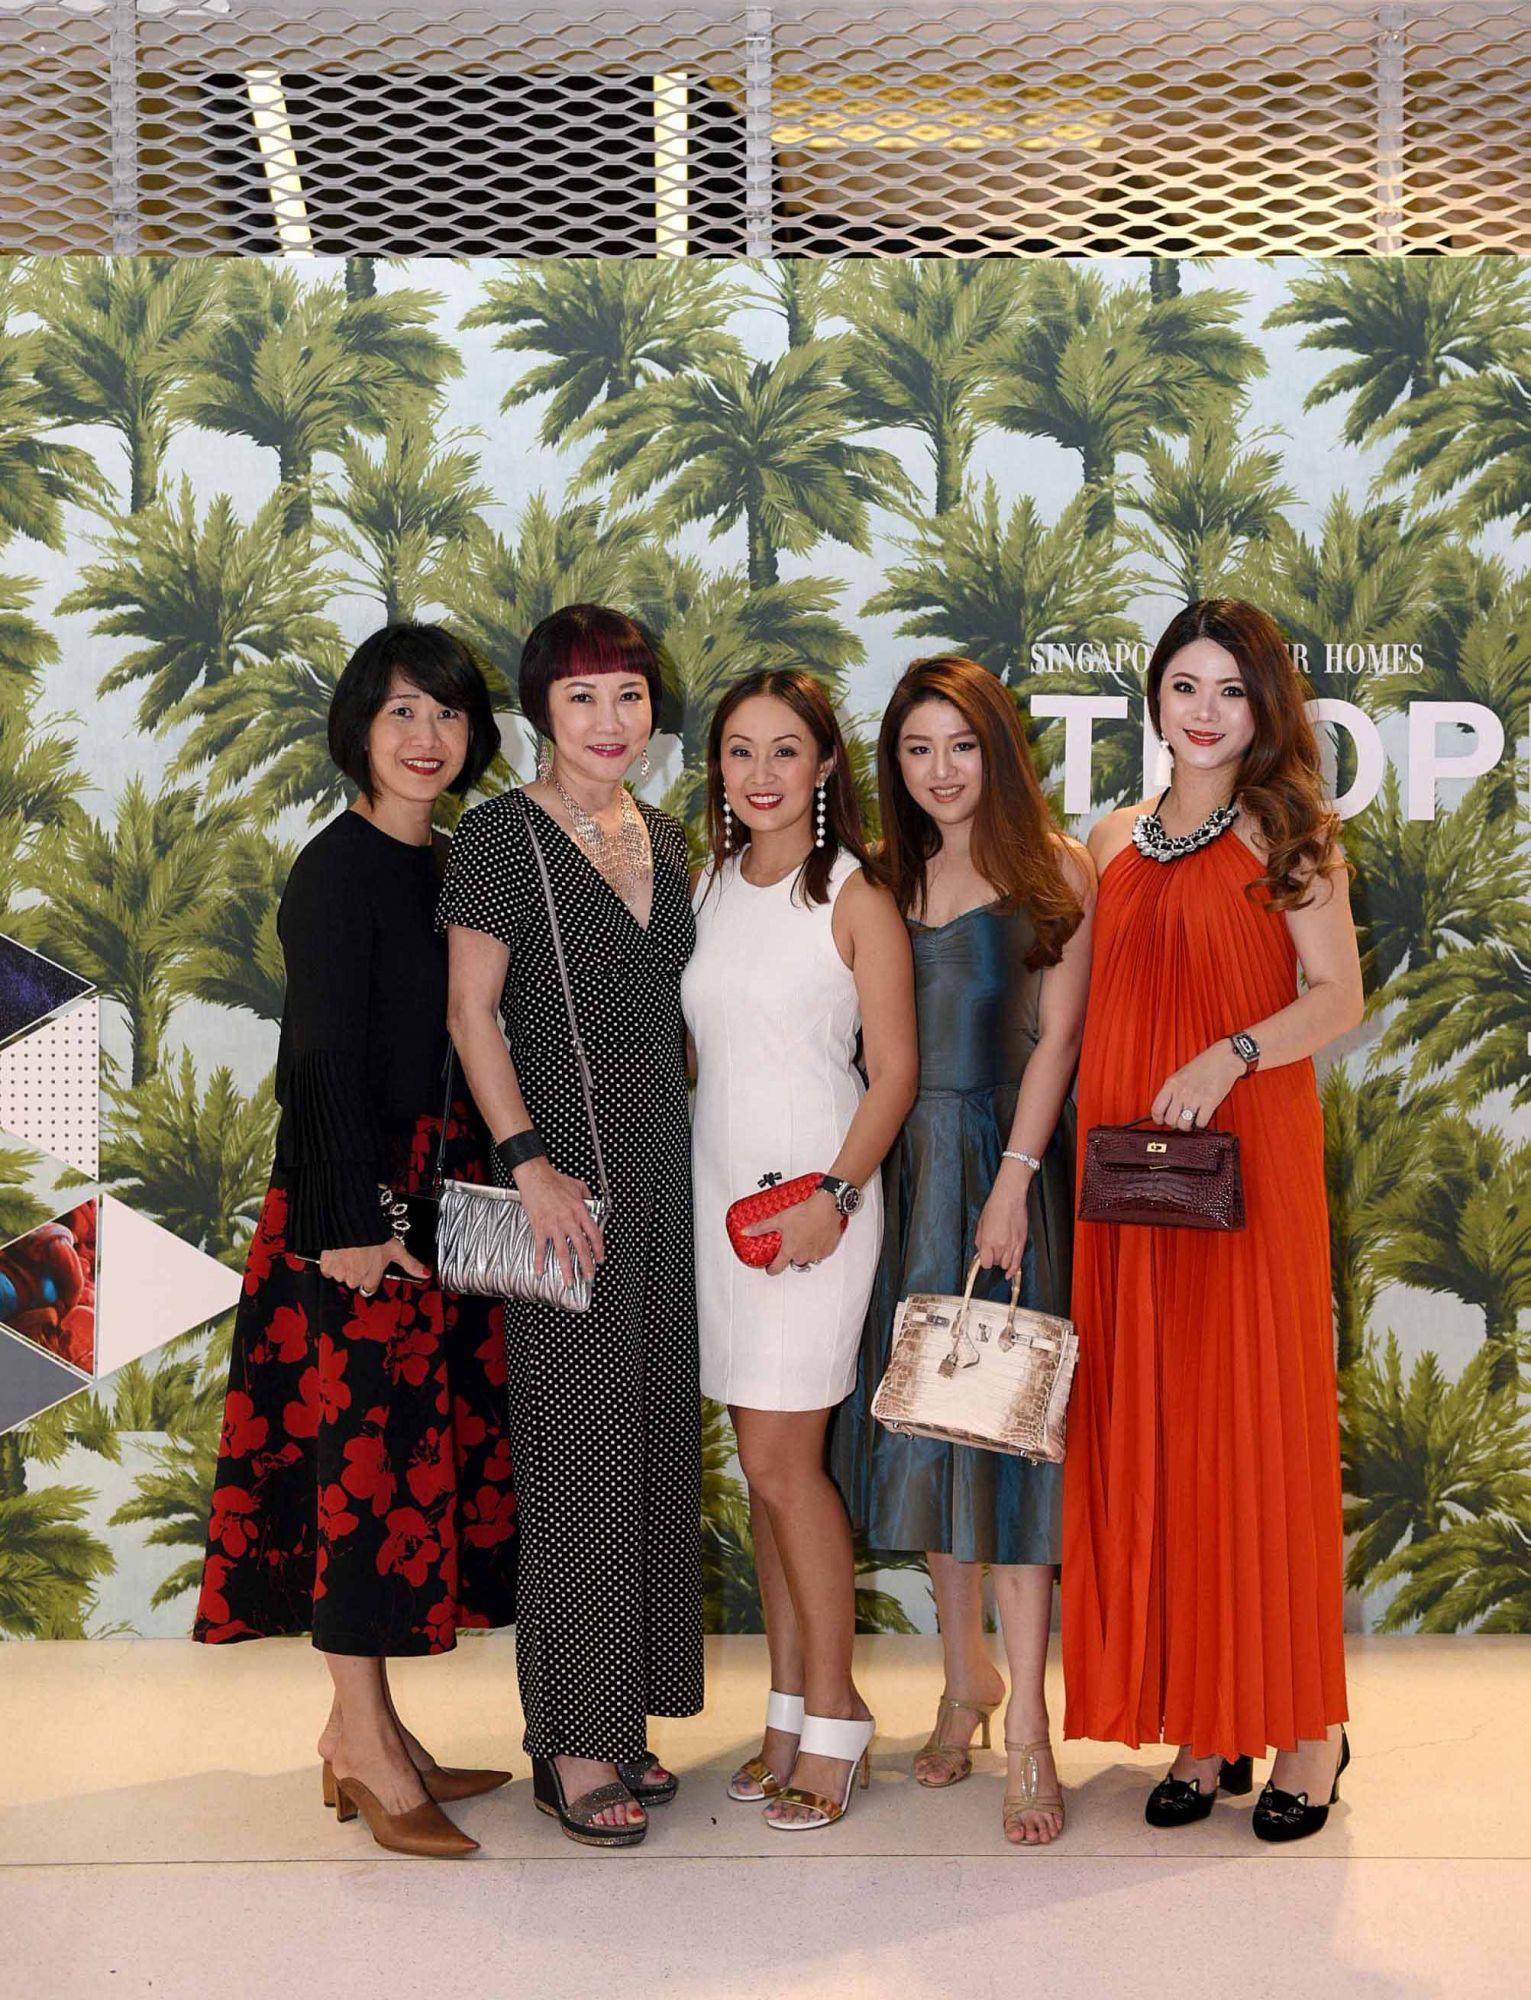 Nancy Ong, Frances Low, Serene Chua, Pamela Ardena, Chermaine Pang